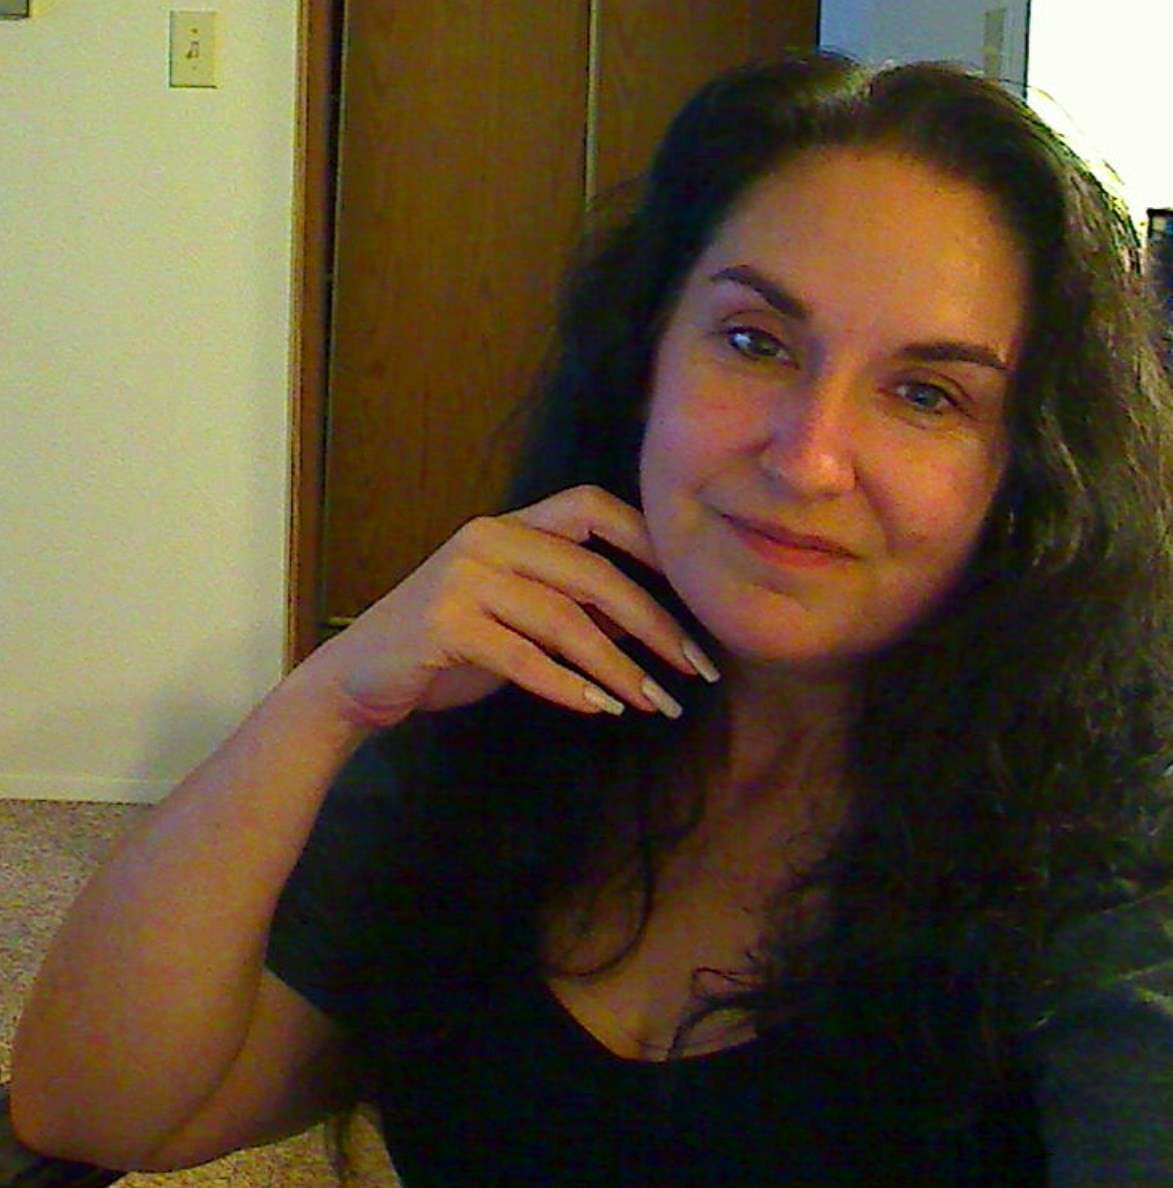 Sandra ables's profile image